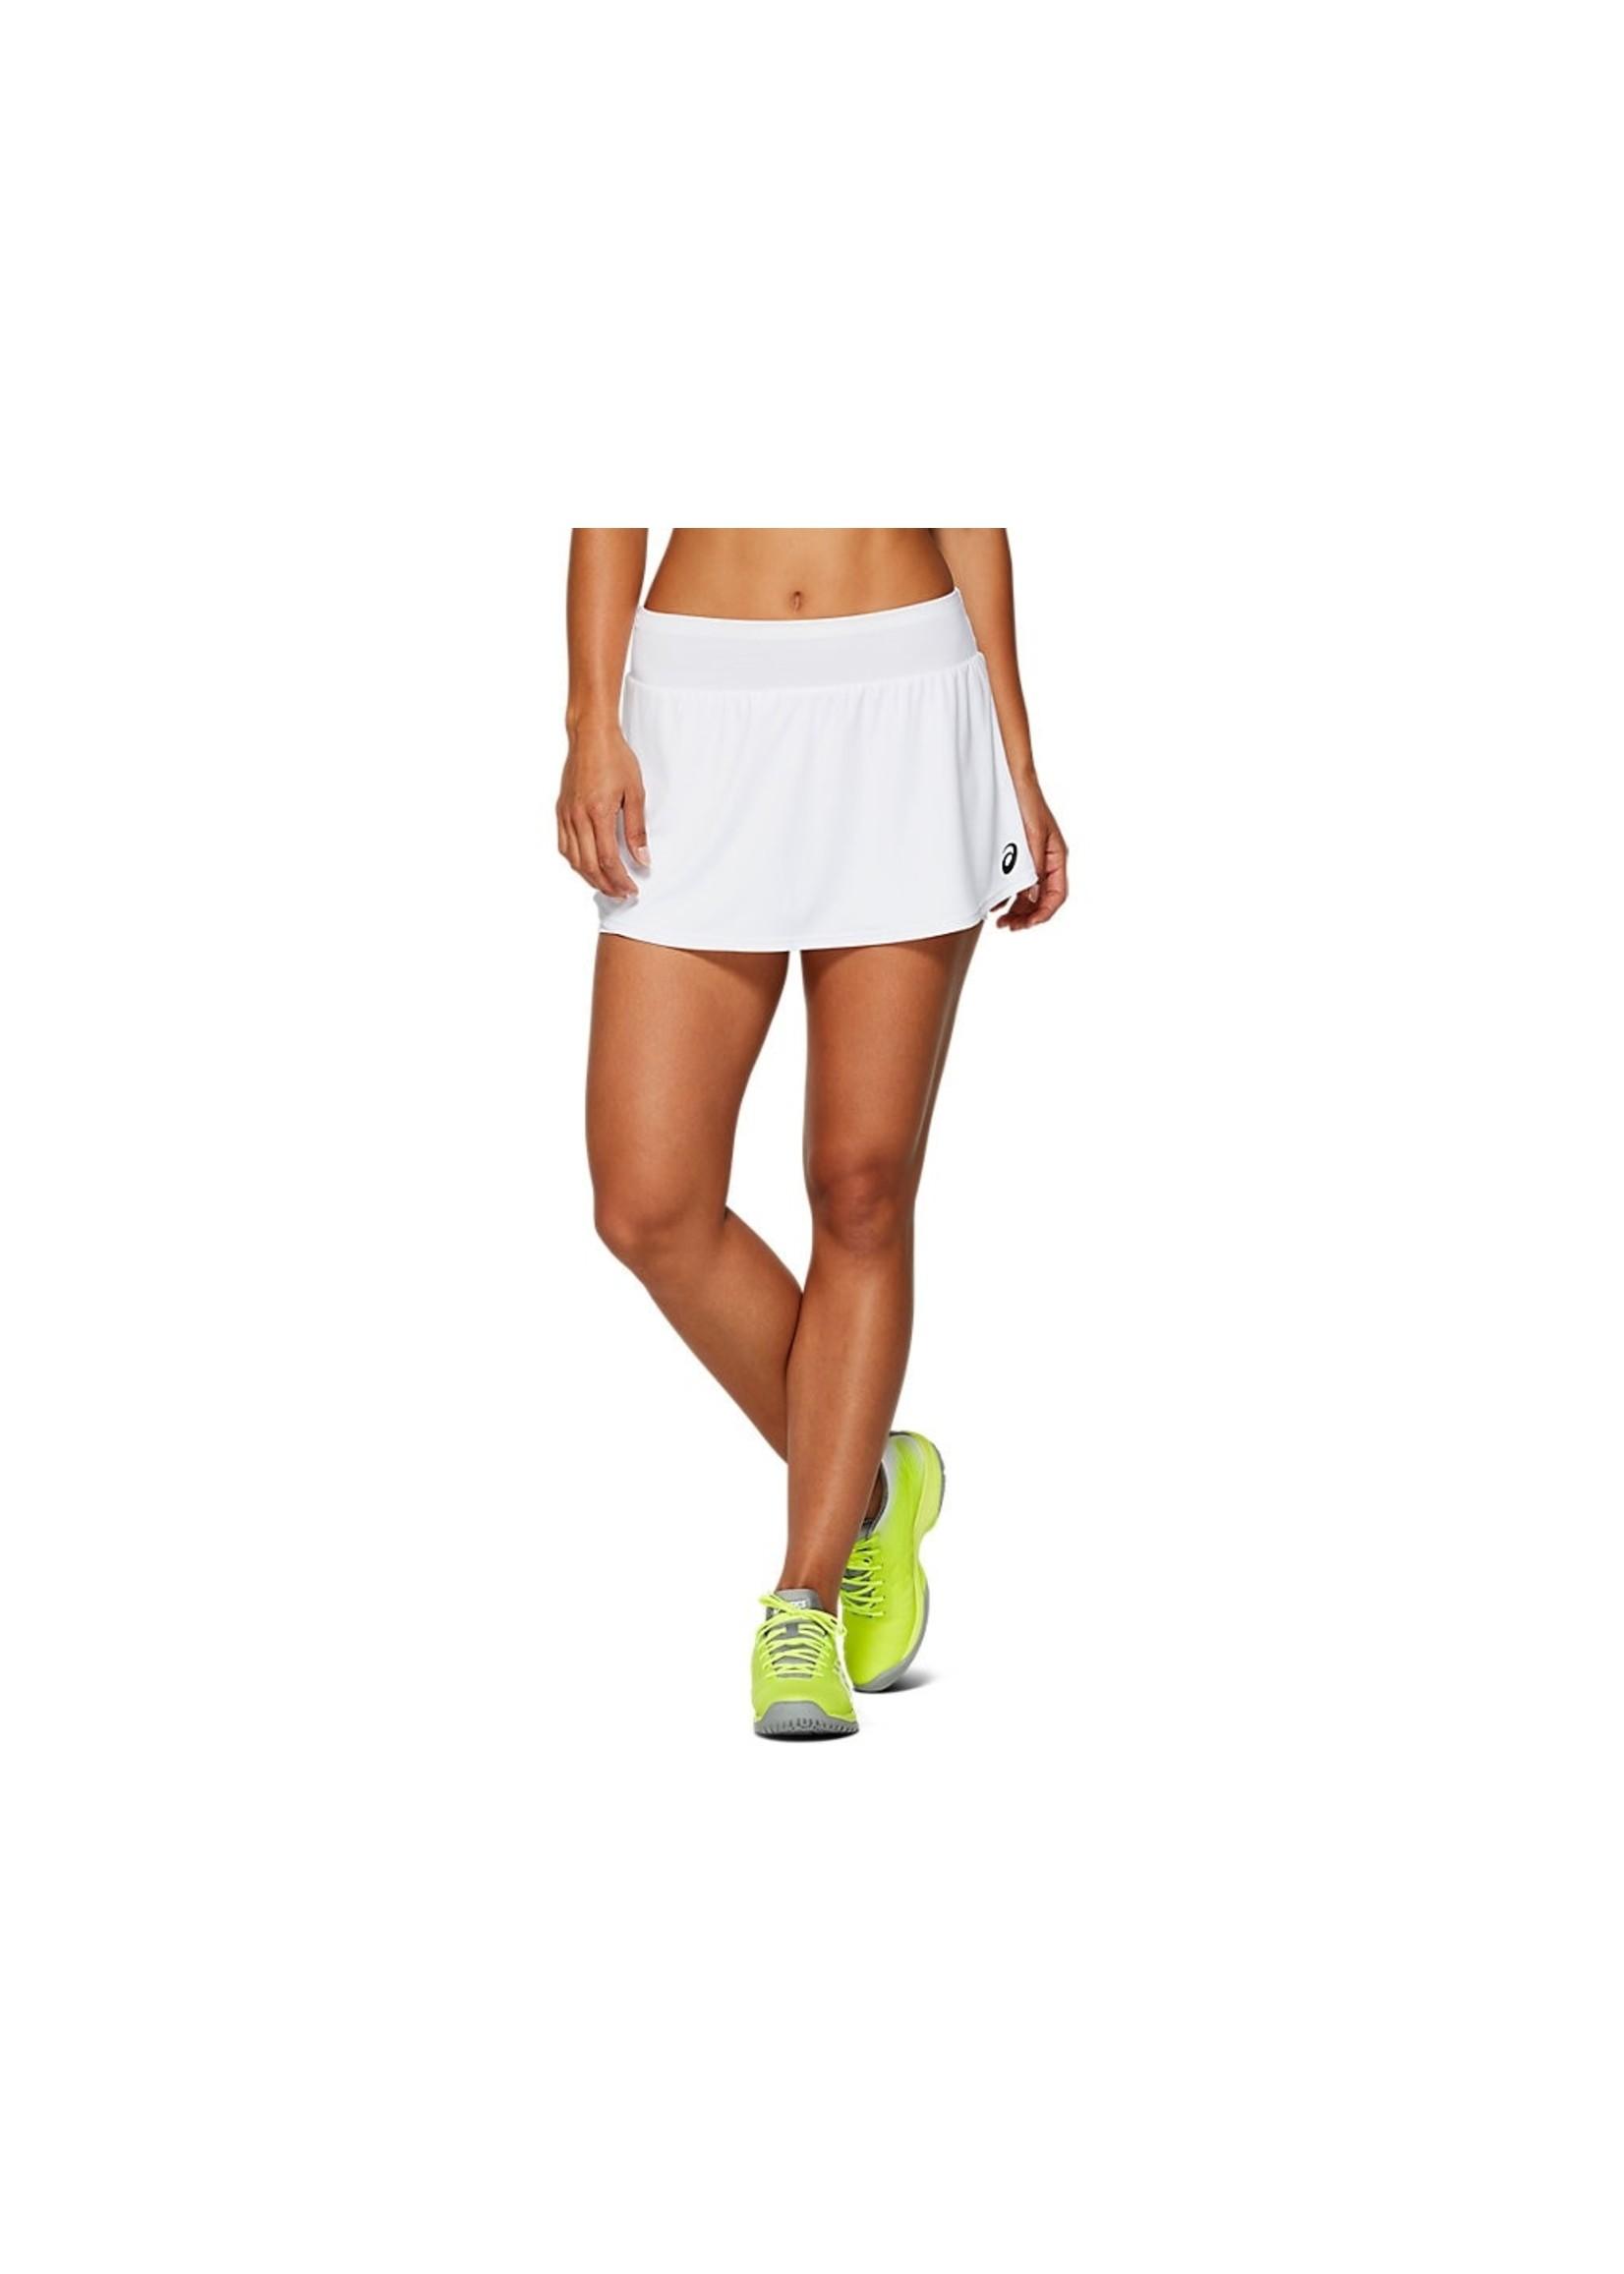 Asics Asics Women's Tennis Club Skort, Brilliant White